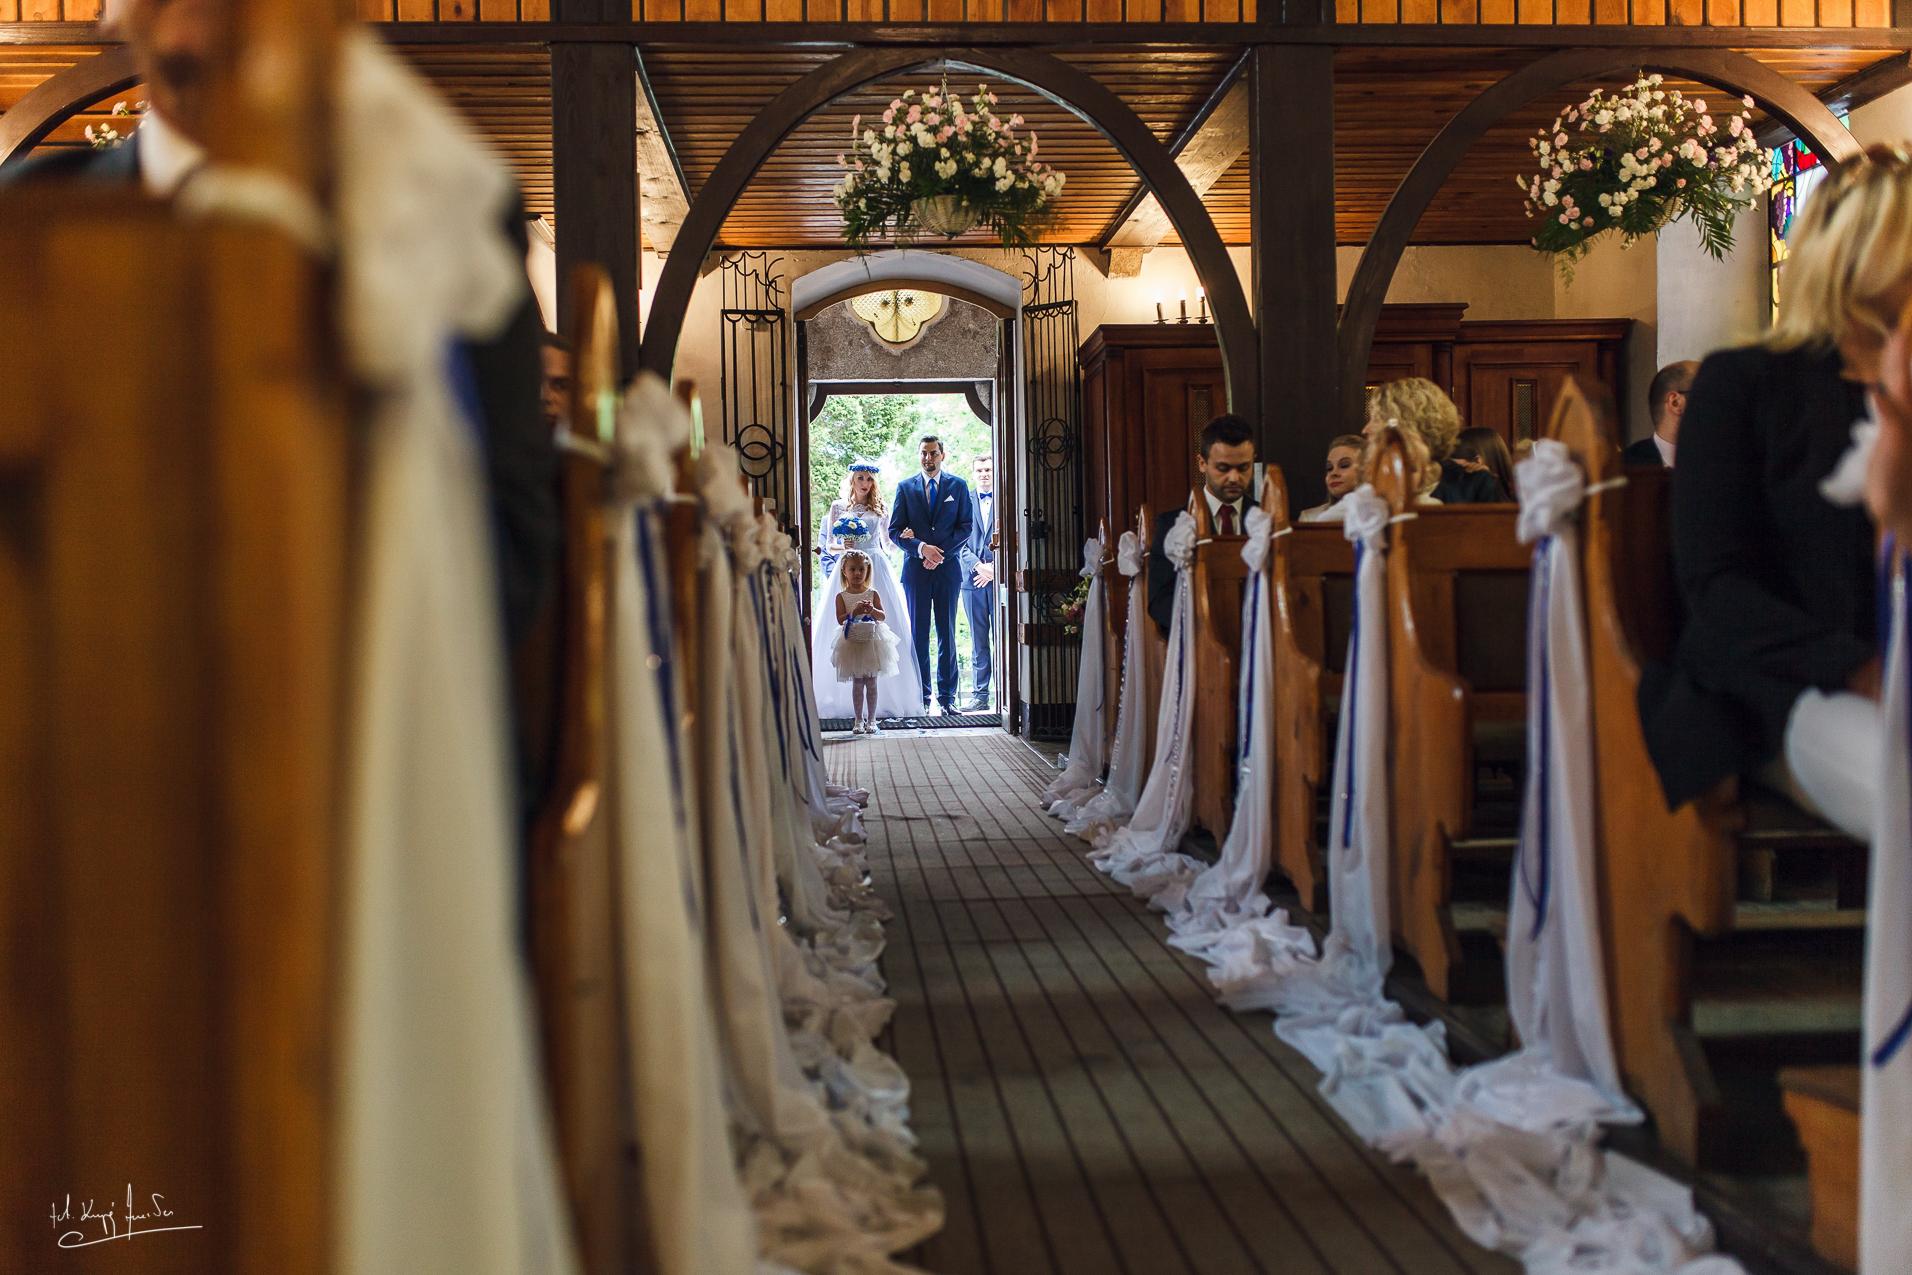 Ślub wesele szklarska poręba 19 Marta & Sławek